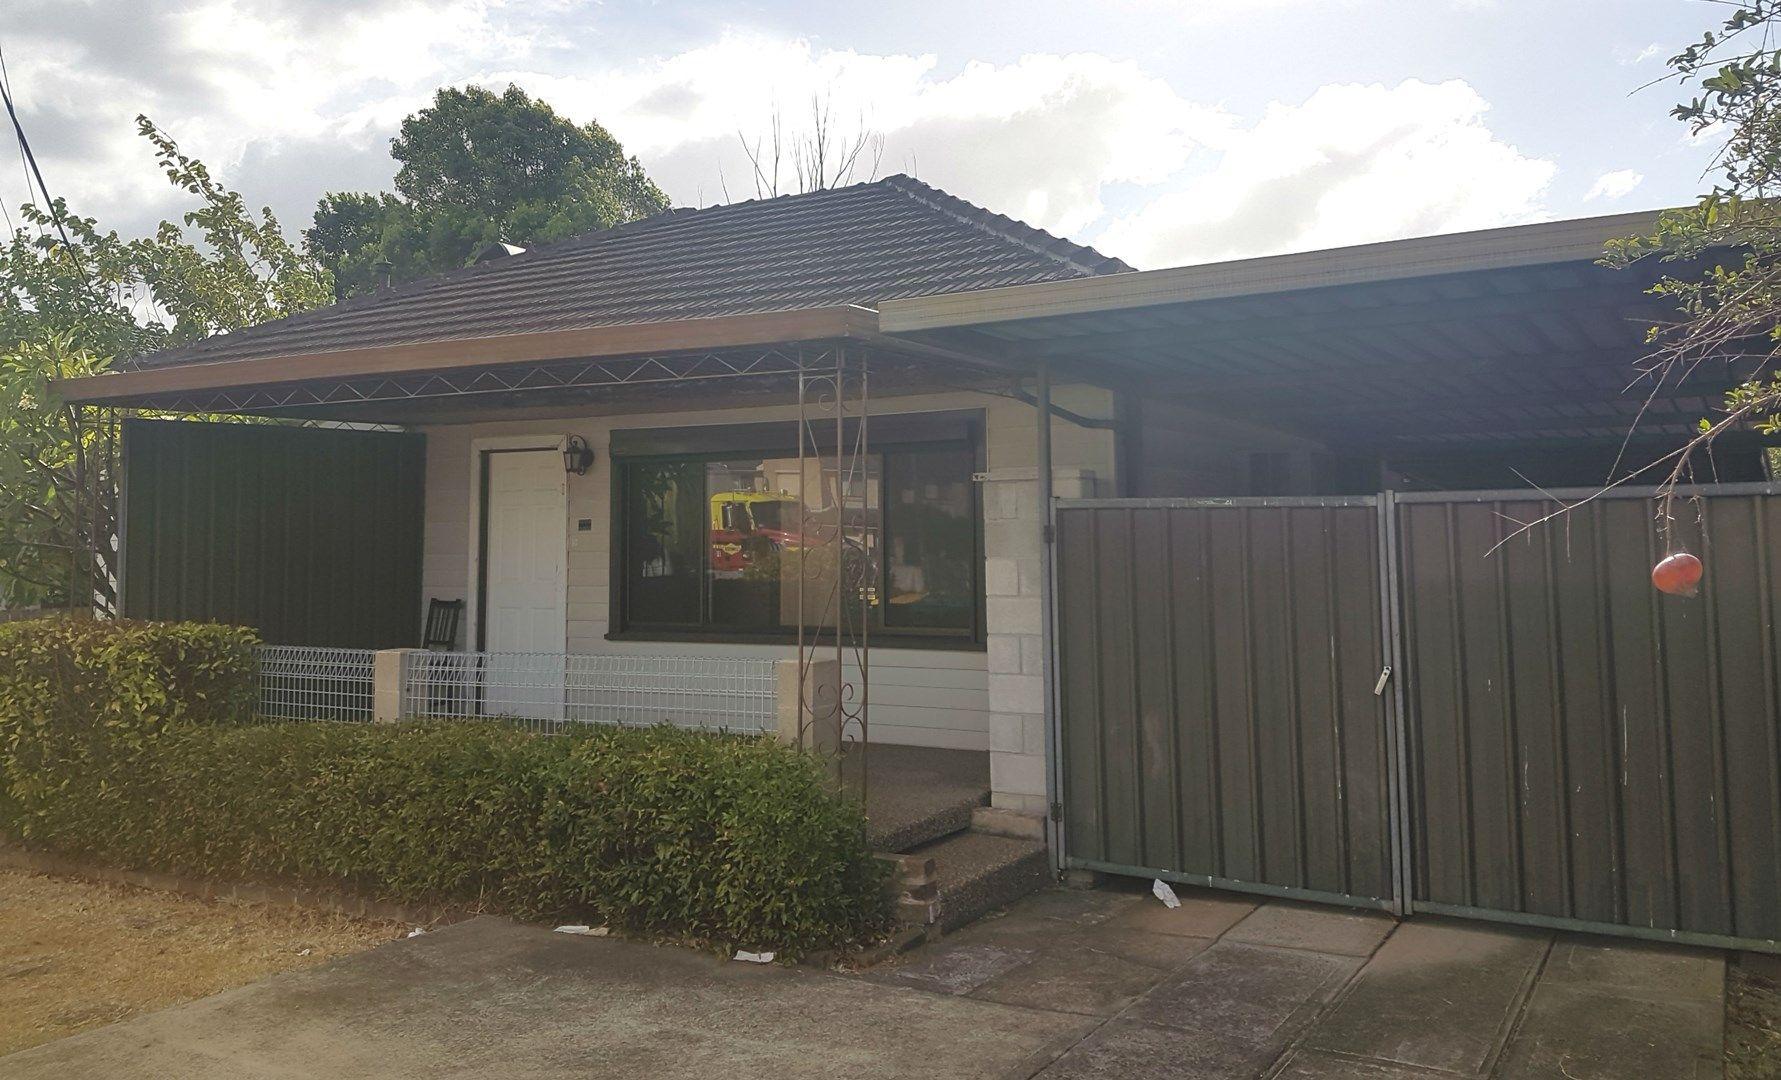 92 CAMBRIDGE STREET, Canley Heights NSW 2166, Image 0